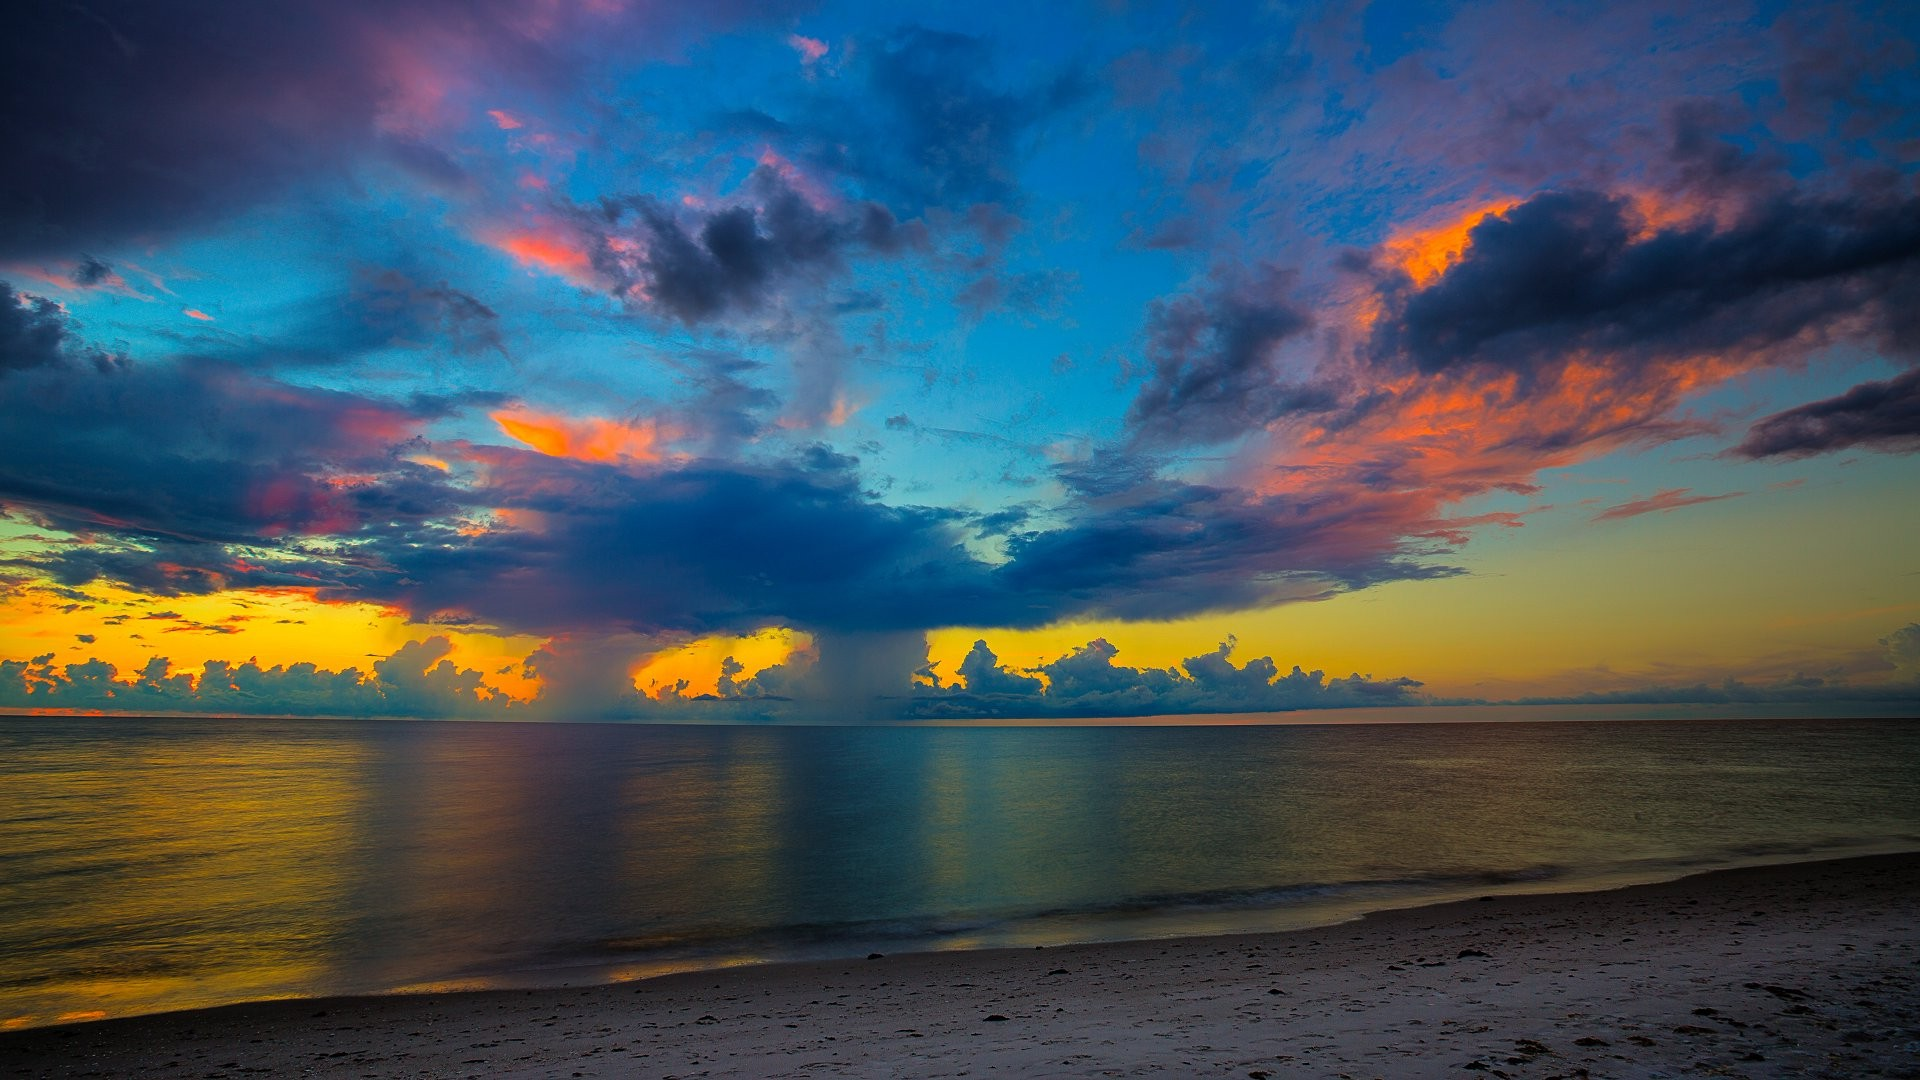 Florida Beach Sunset, HD Nature, 4k Wallpapers, Images ...